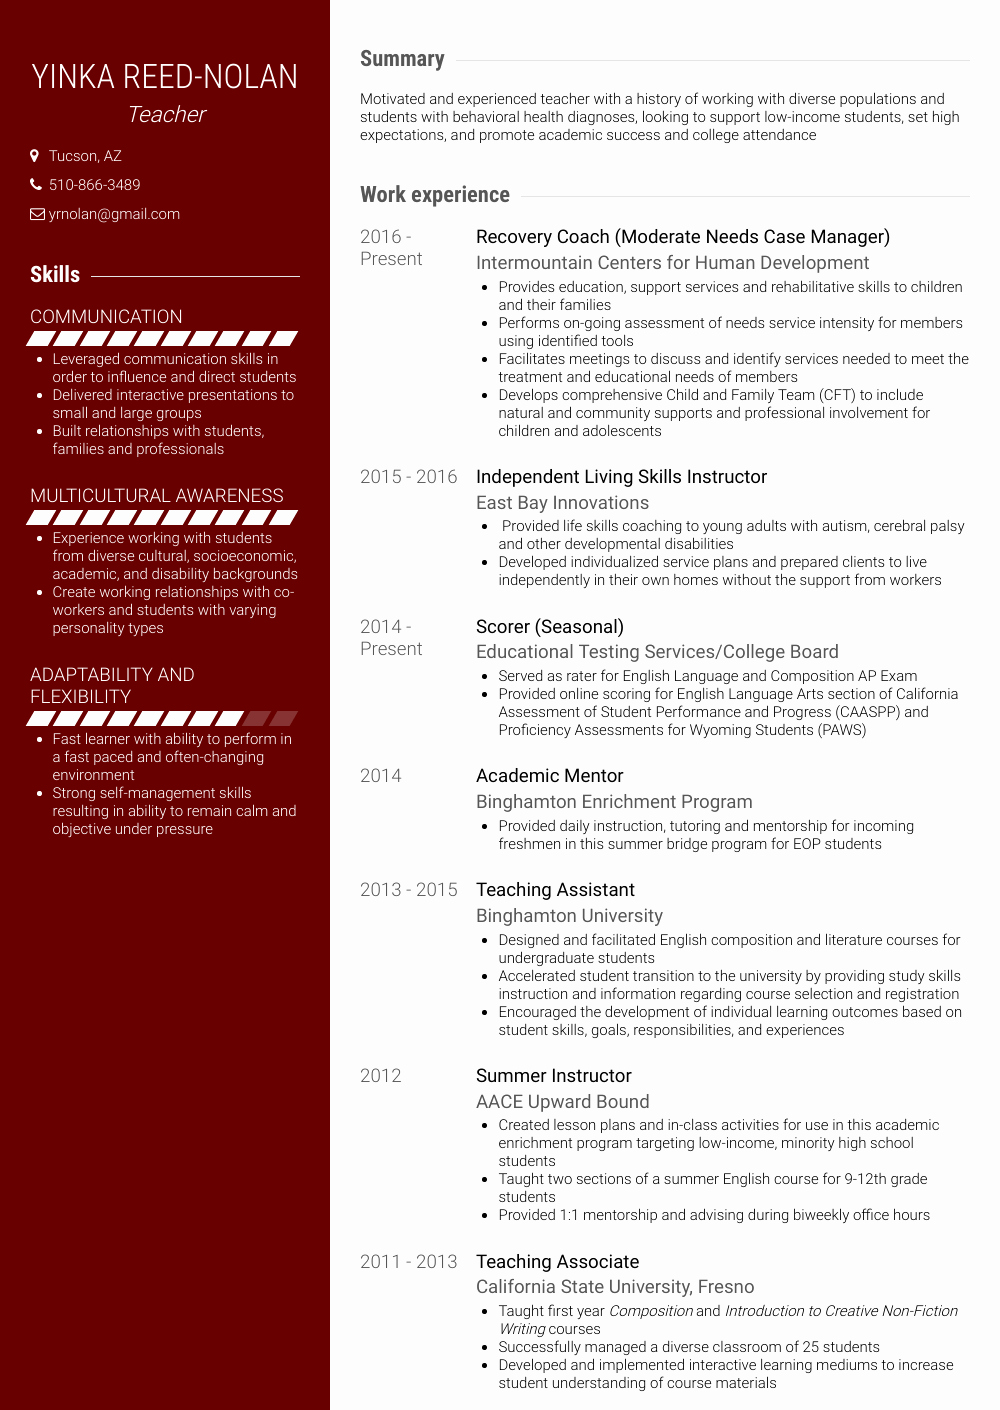 Teaching assistant Sample Resume Beautiful Teaching assistant Resume Samples & Templates